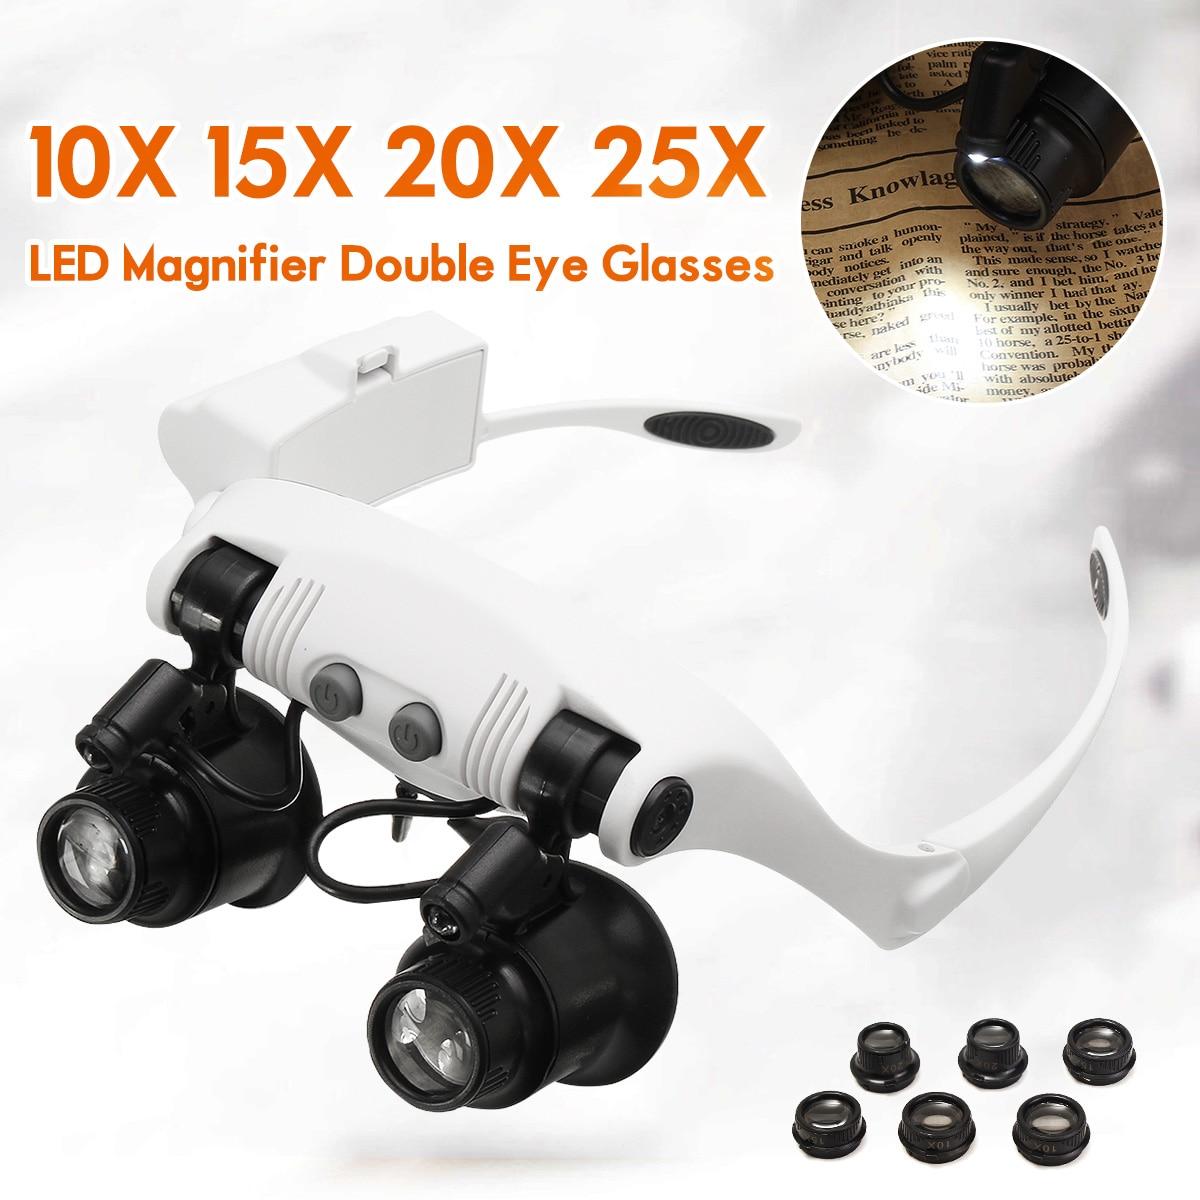 LED Lamp 10X 15X 20X 25X LED Magnifiers Double Eye Glasses Loupe Lens Jeweler Watch Repair Measurement 20-50mm with 8 Lens окуляр для зрительных труб nikon prostaff 5 20x 25x